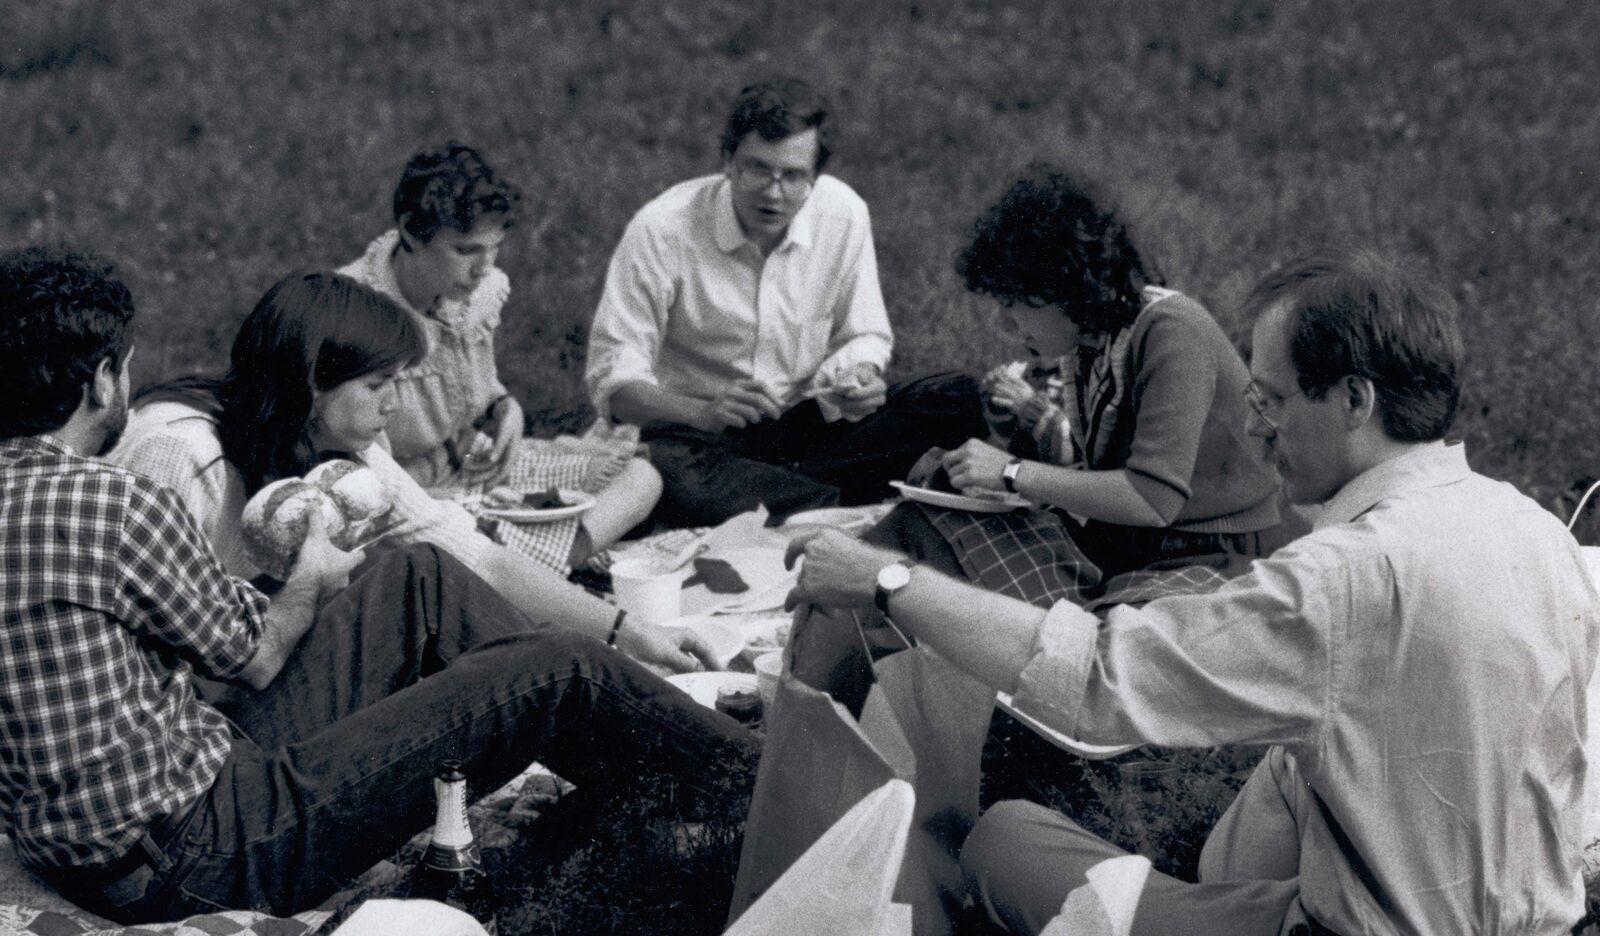 Samuel G. Freedman (left),Arthur Sulzberger, Jr (center),Jeff Schmalz (right), and other New York Times journalists